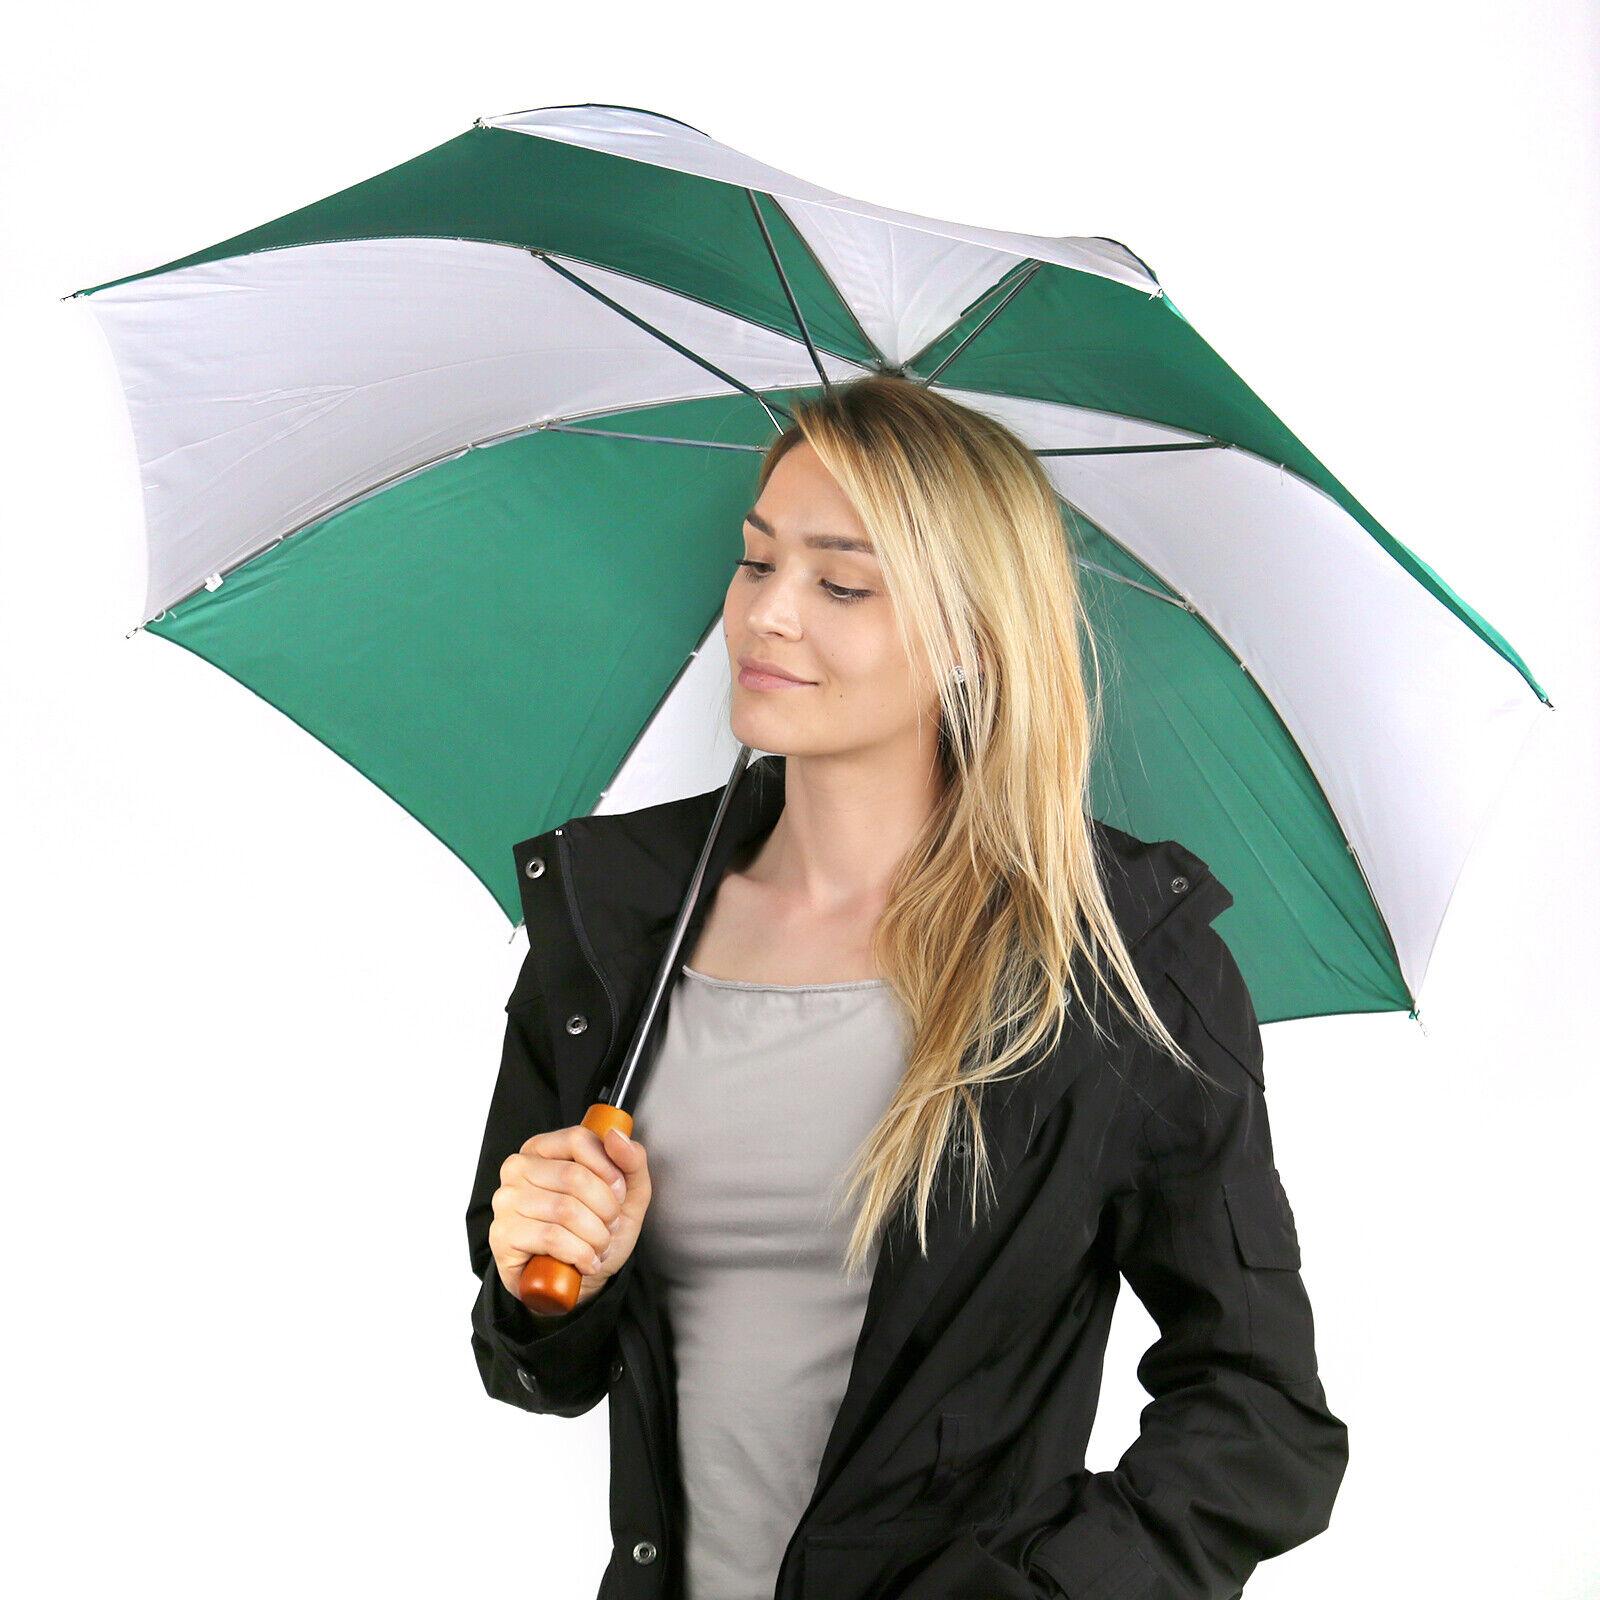 2er SET Regenschirm Stockschirm Automatik Golfschirm Holzgriff stabil grün weiß